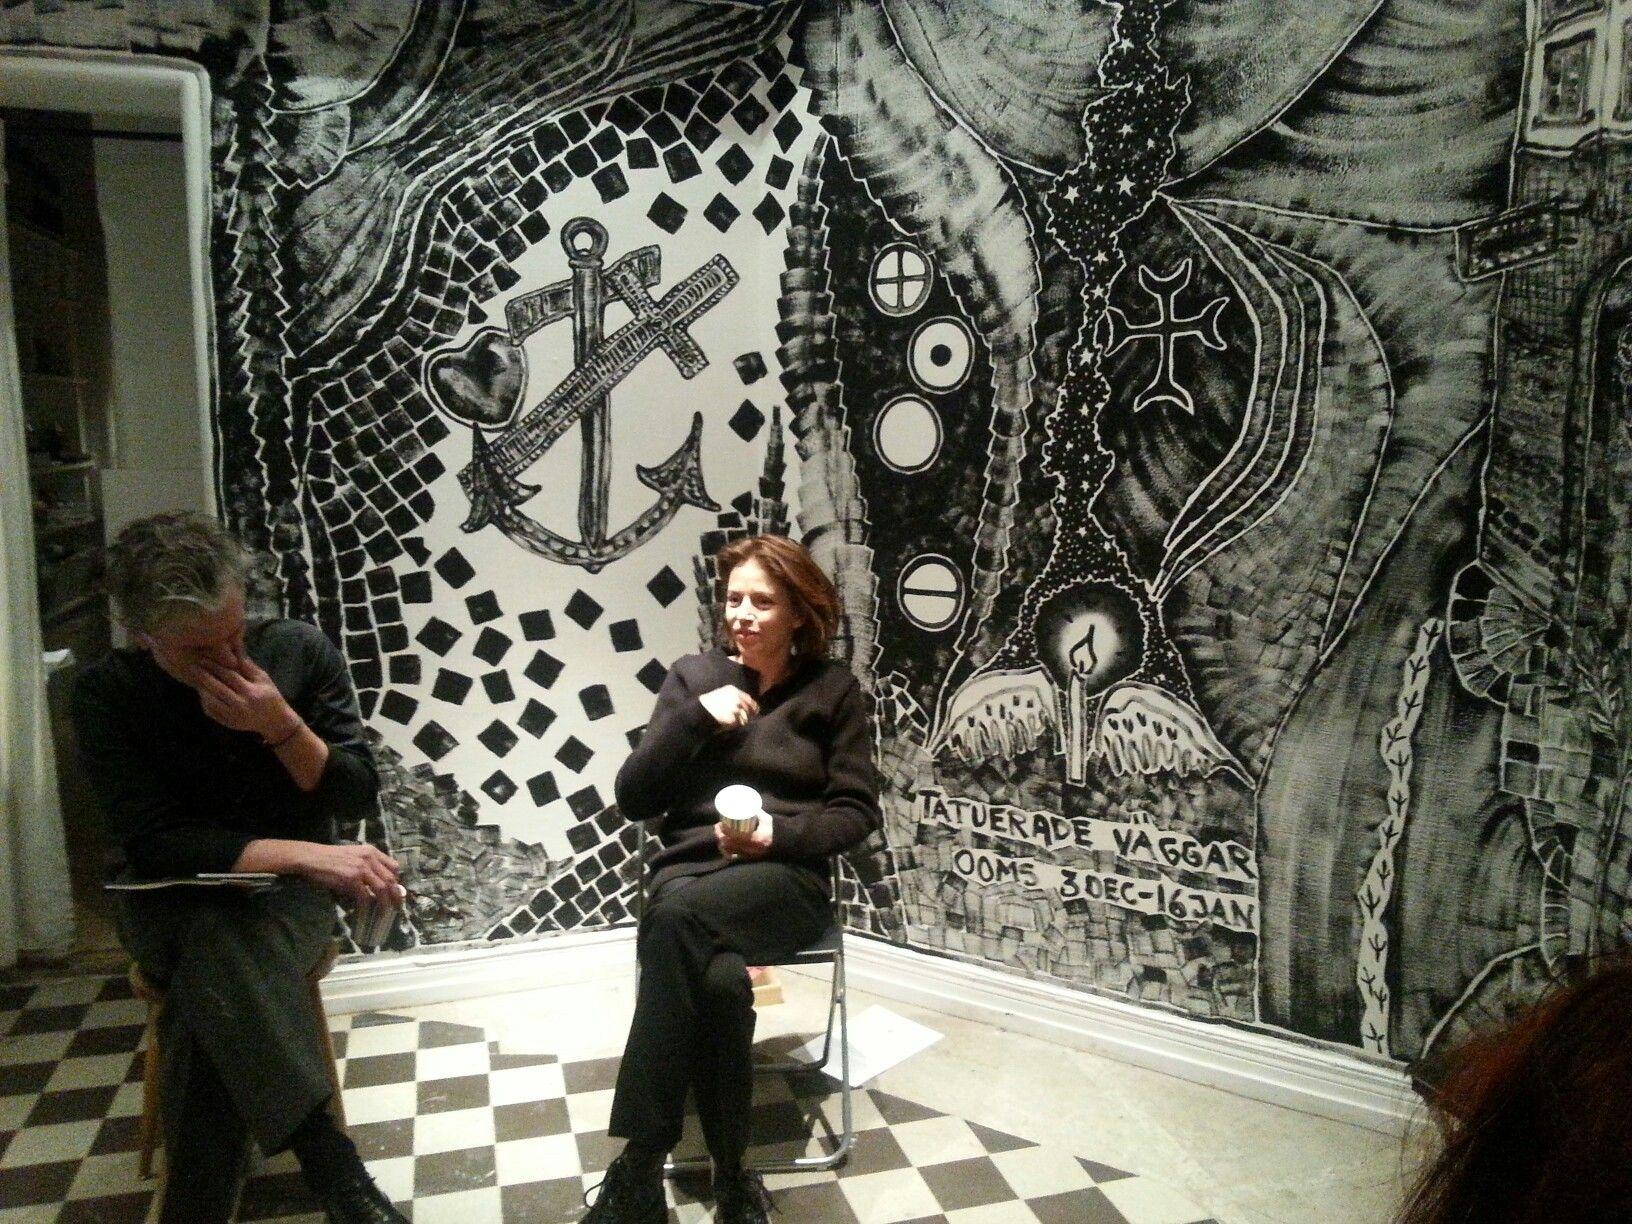 Amanda Ooms tatuerade väggar - amanda ooms inredningskonst